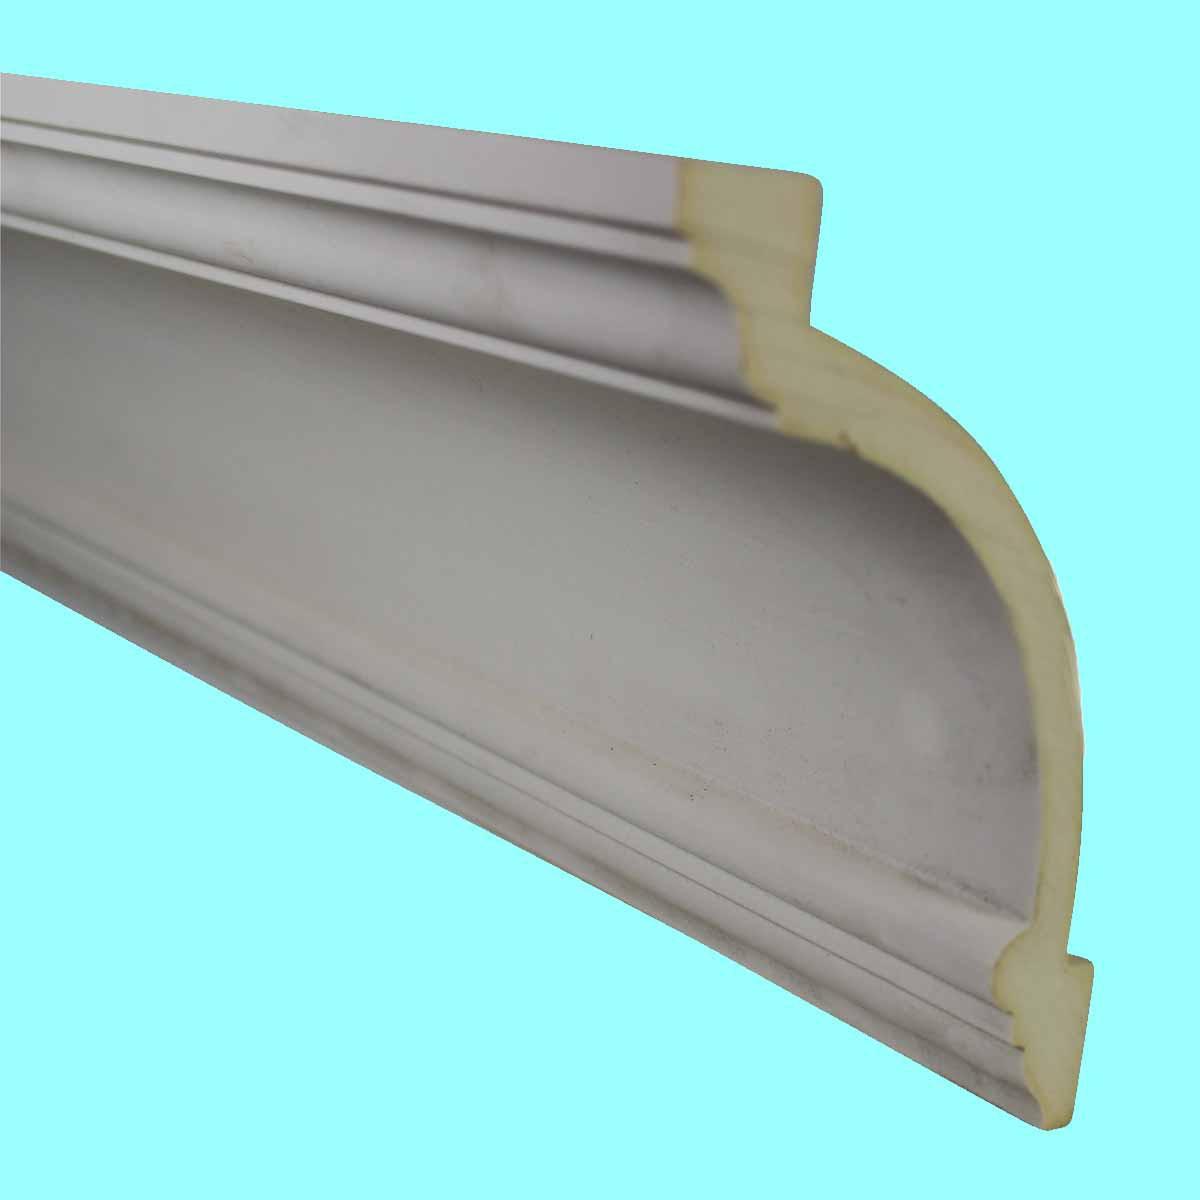 Cornice White Urethane Sample of 11478 24 Long Cornice Cornice Moulding Cornice Molding